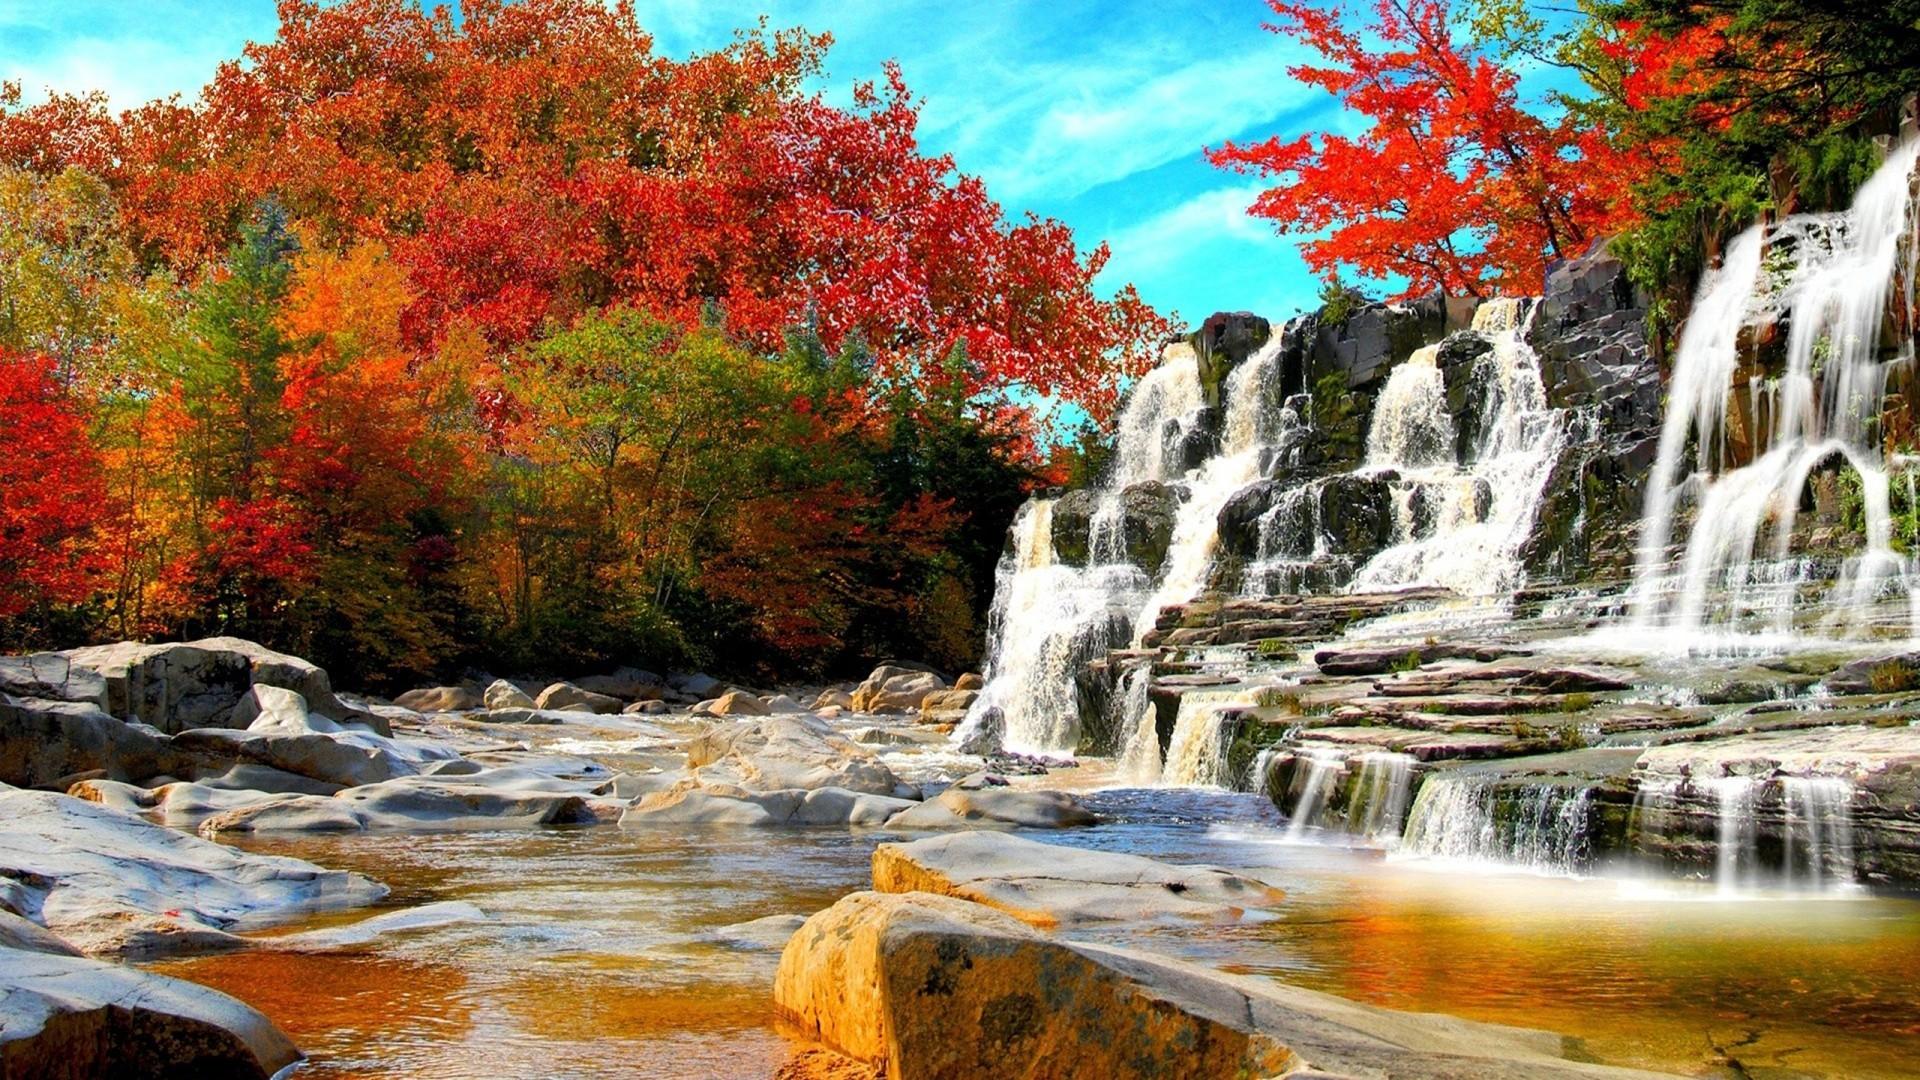 Autumn Wallpaper HD (79+ Images